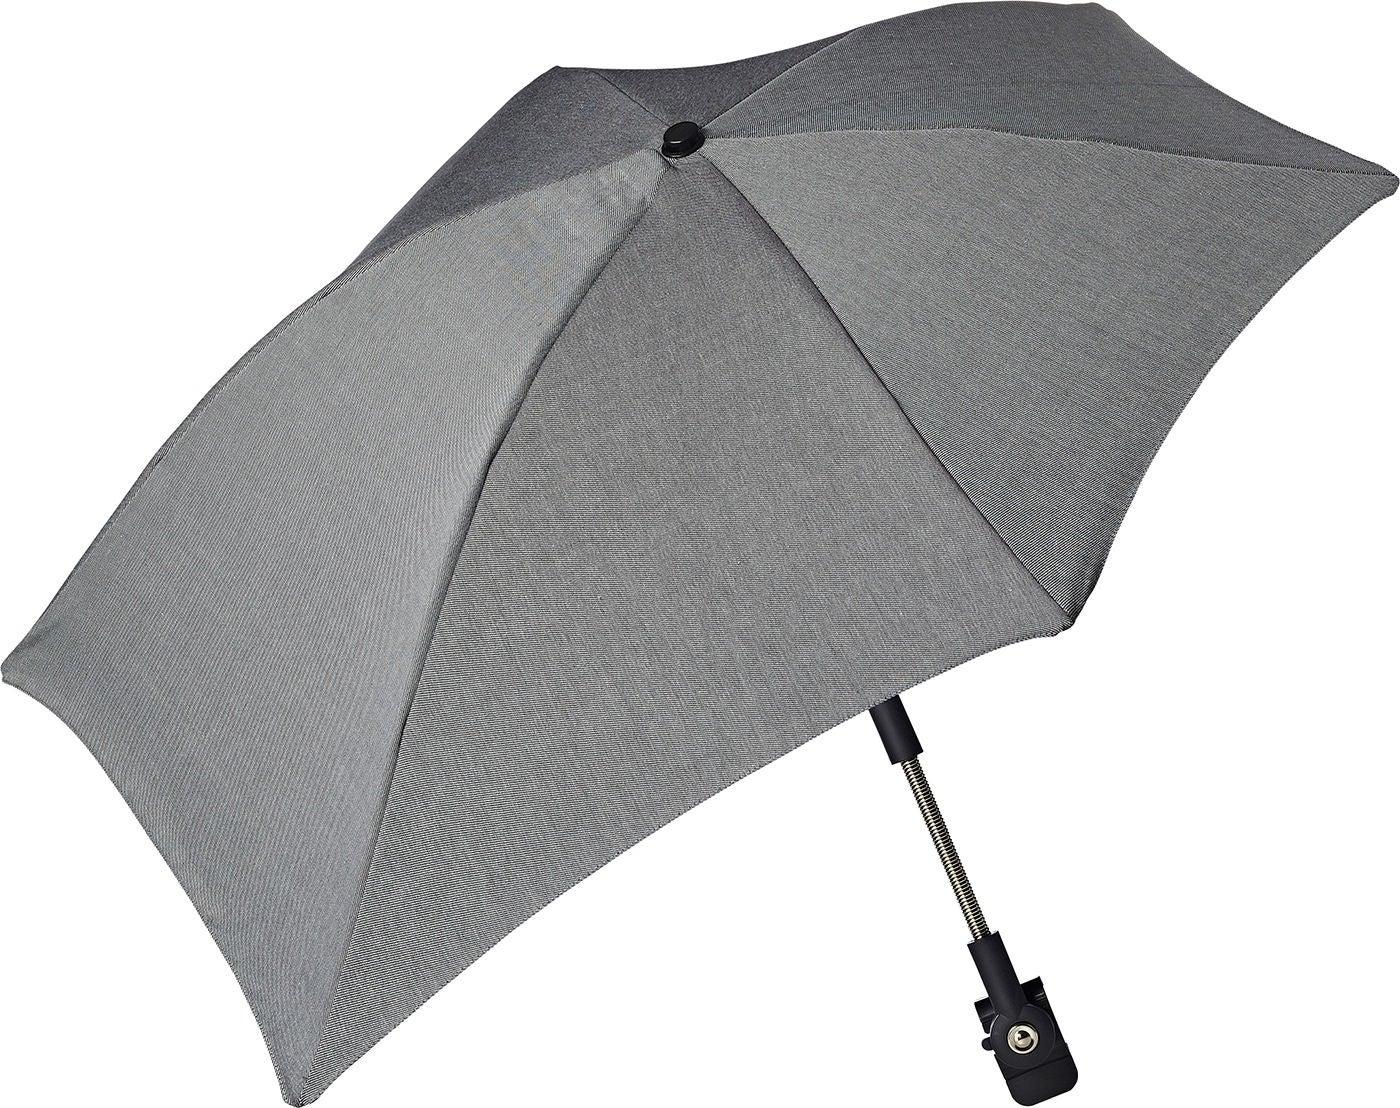 Joolz Uni 2 Parasoll, Superior Grey